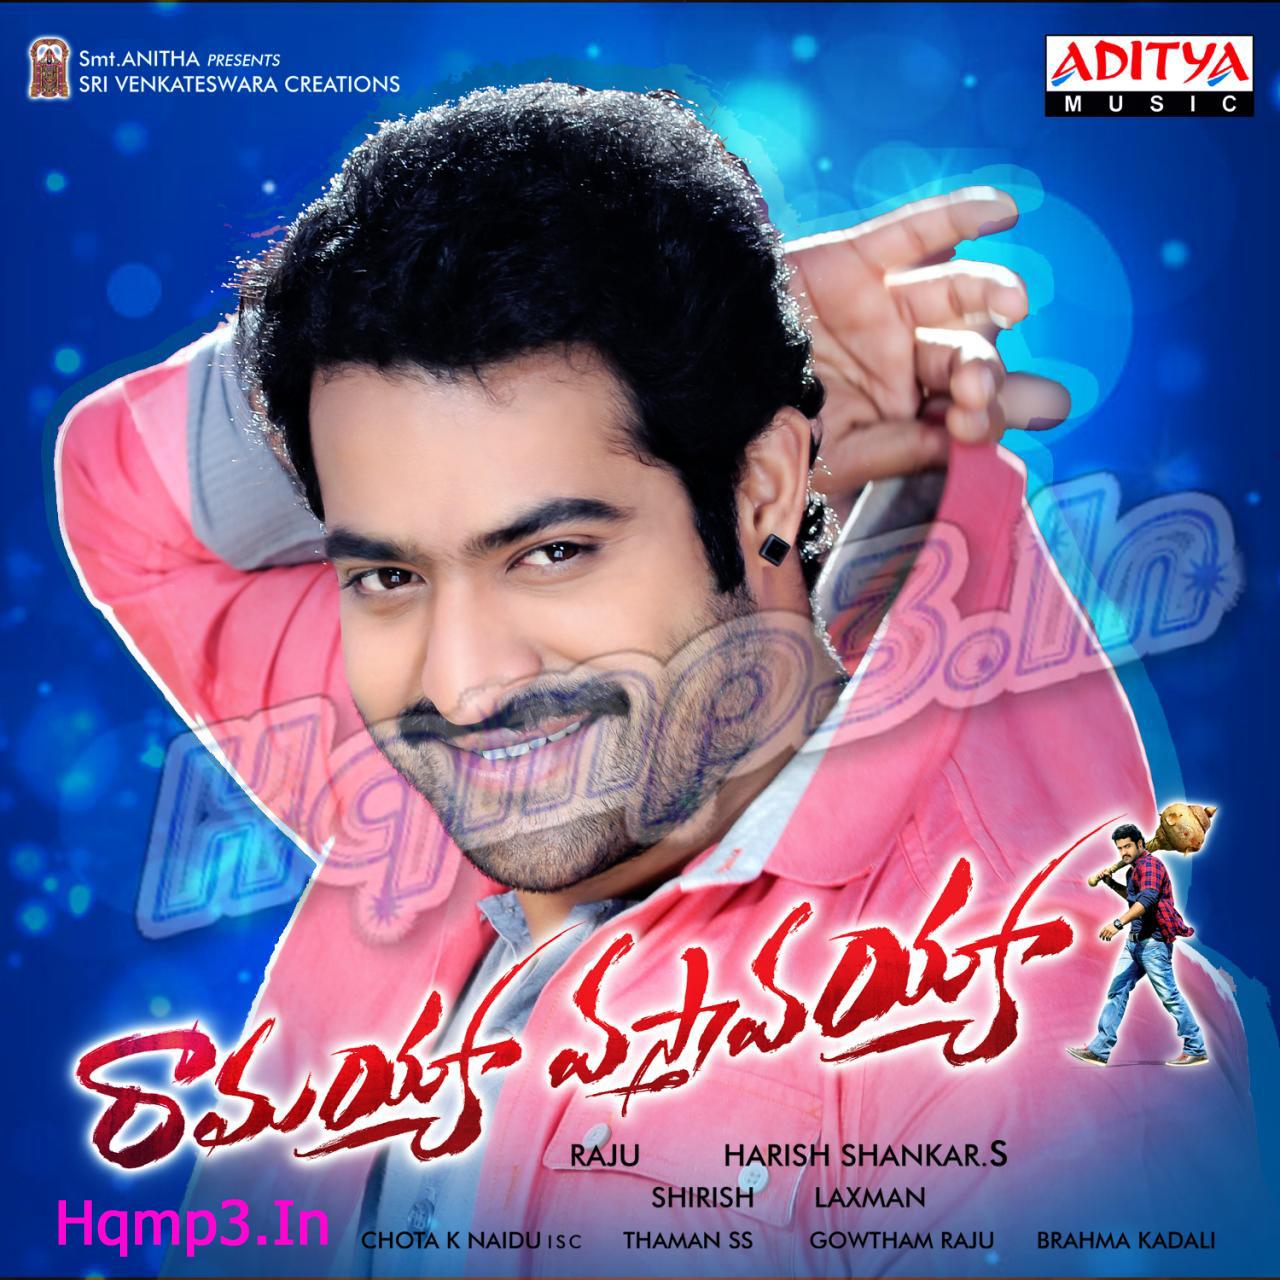 A Telugu Movies Mp3 Songs: Ramayya Vasthavayya Songs [2013] Ntr Telugu Mp3 Songs